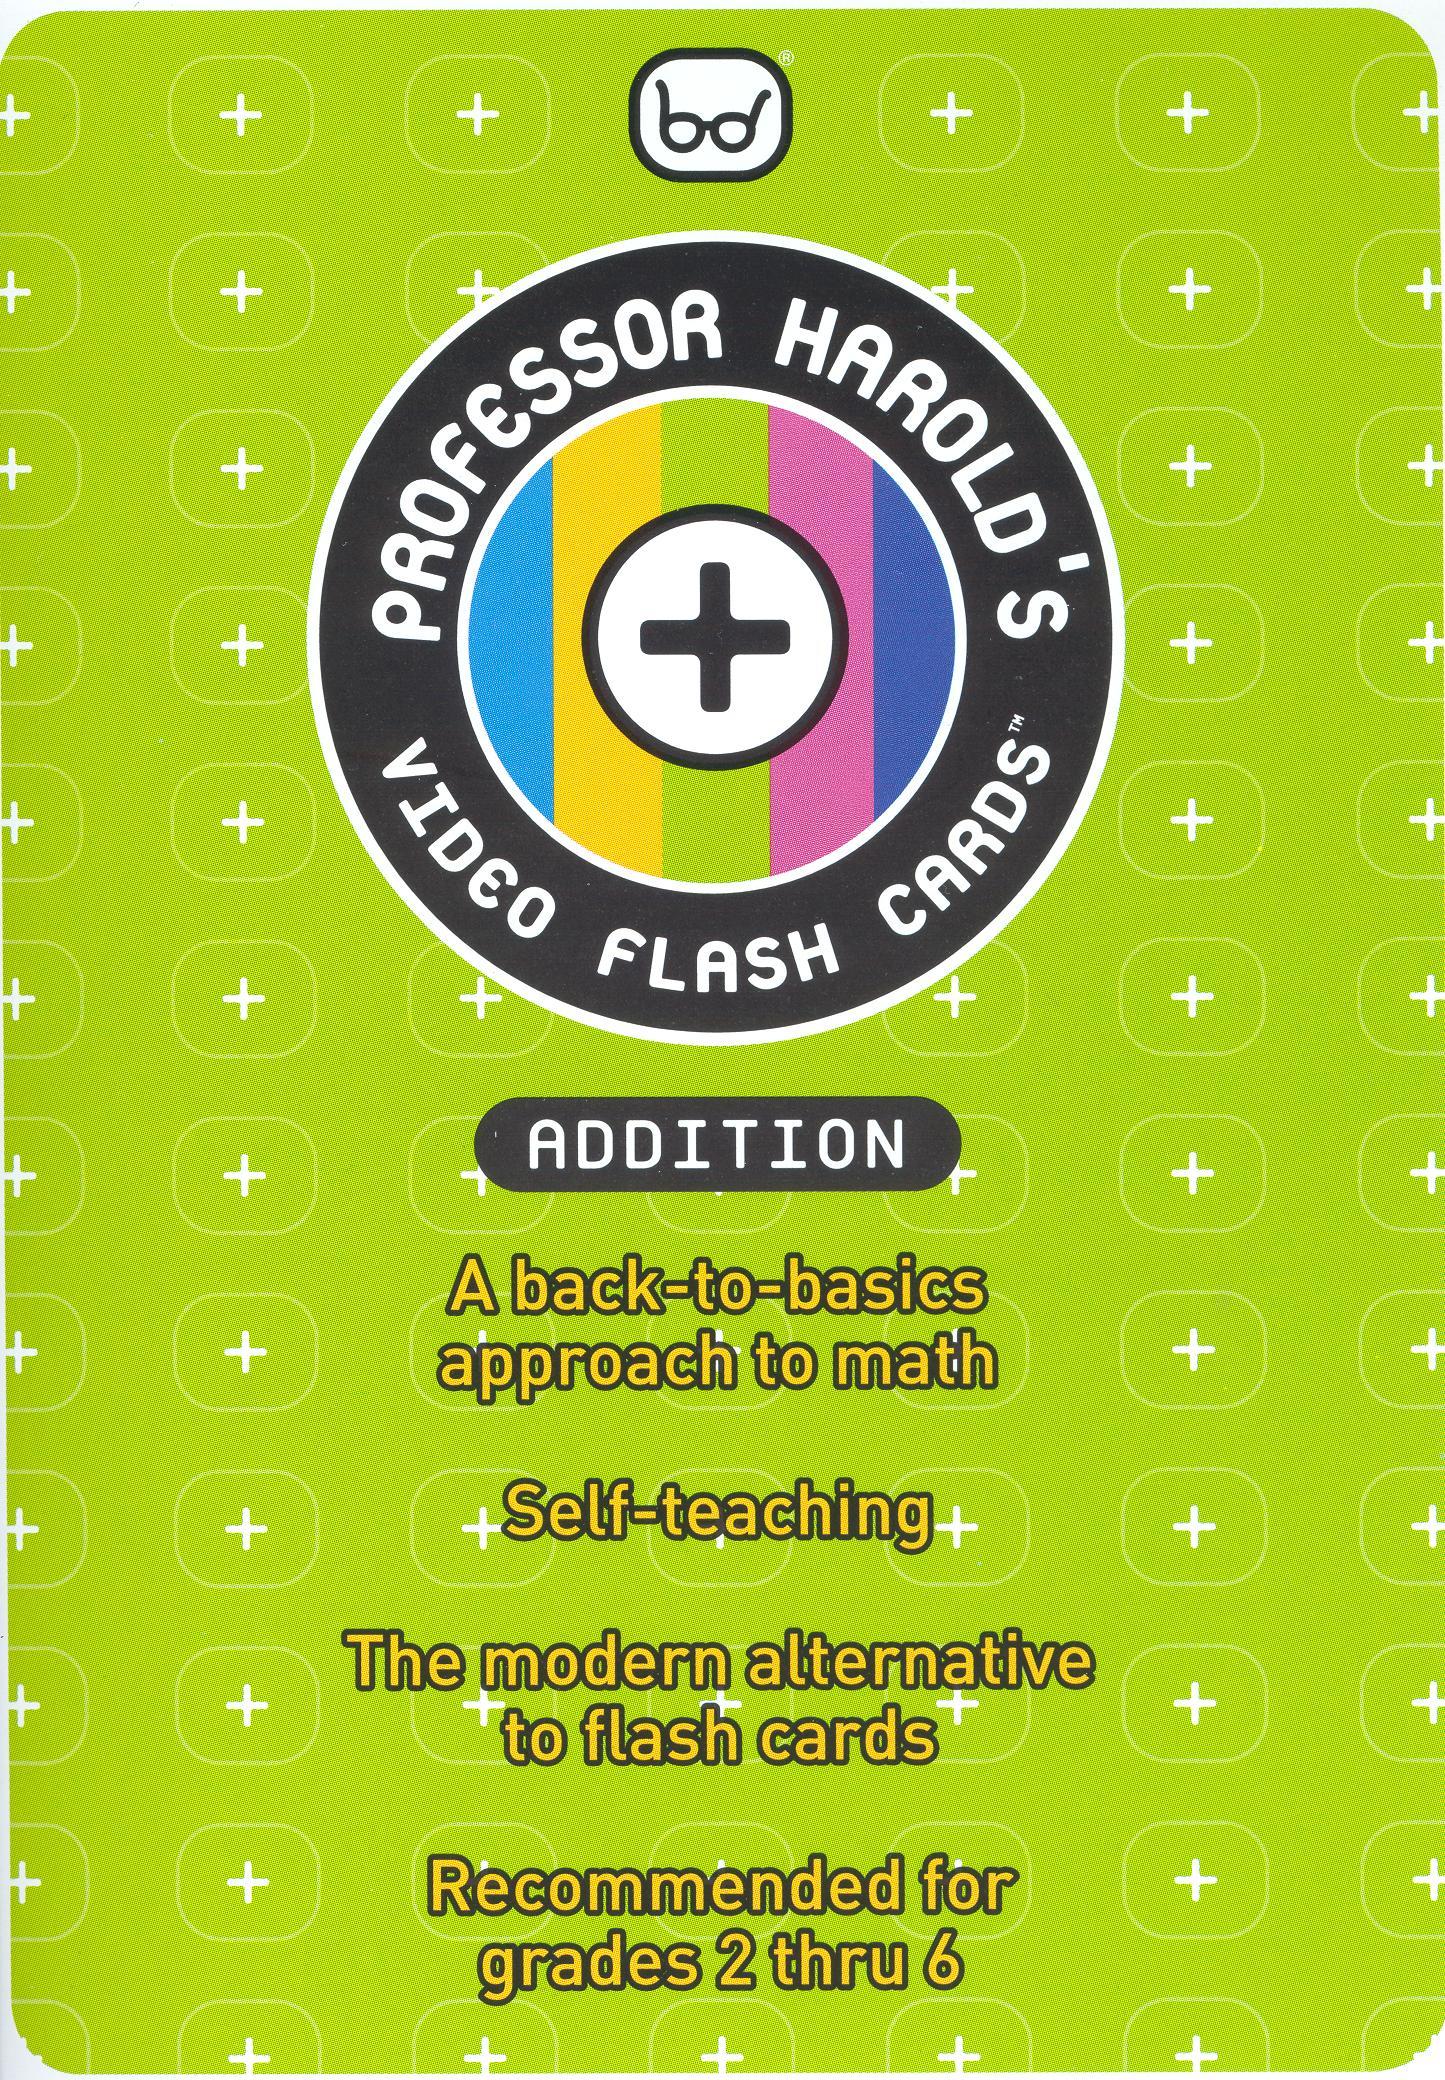 Prof. Harold Video Flash Cards: Addition